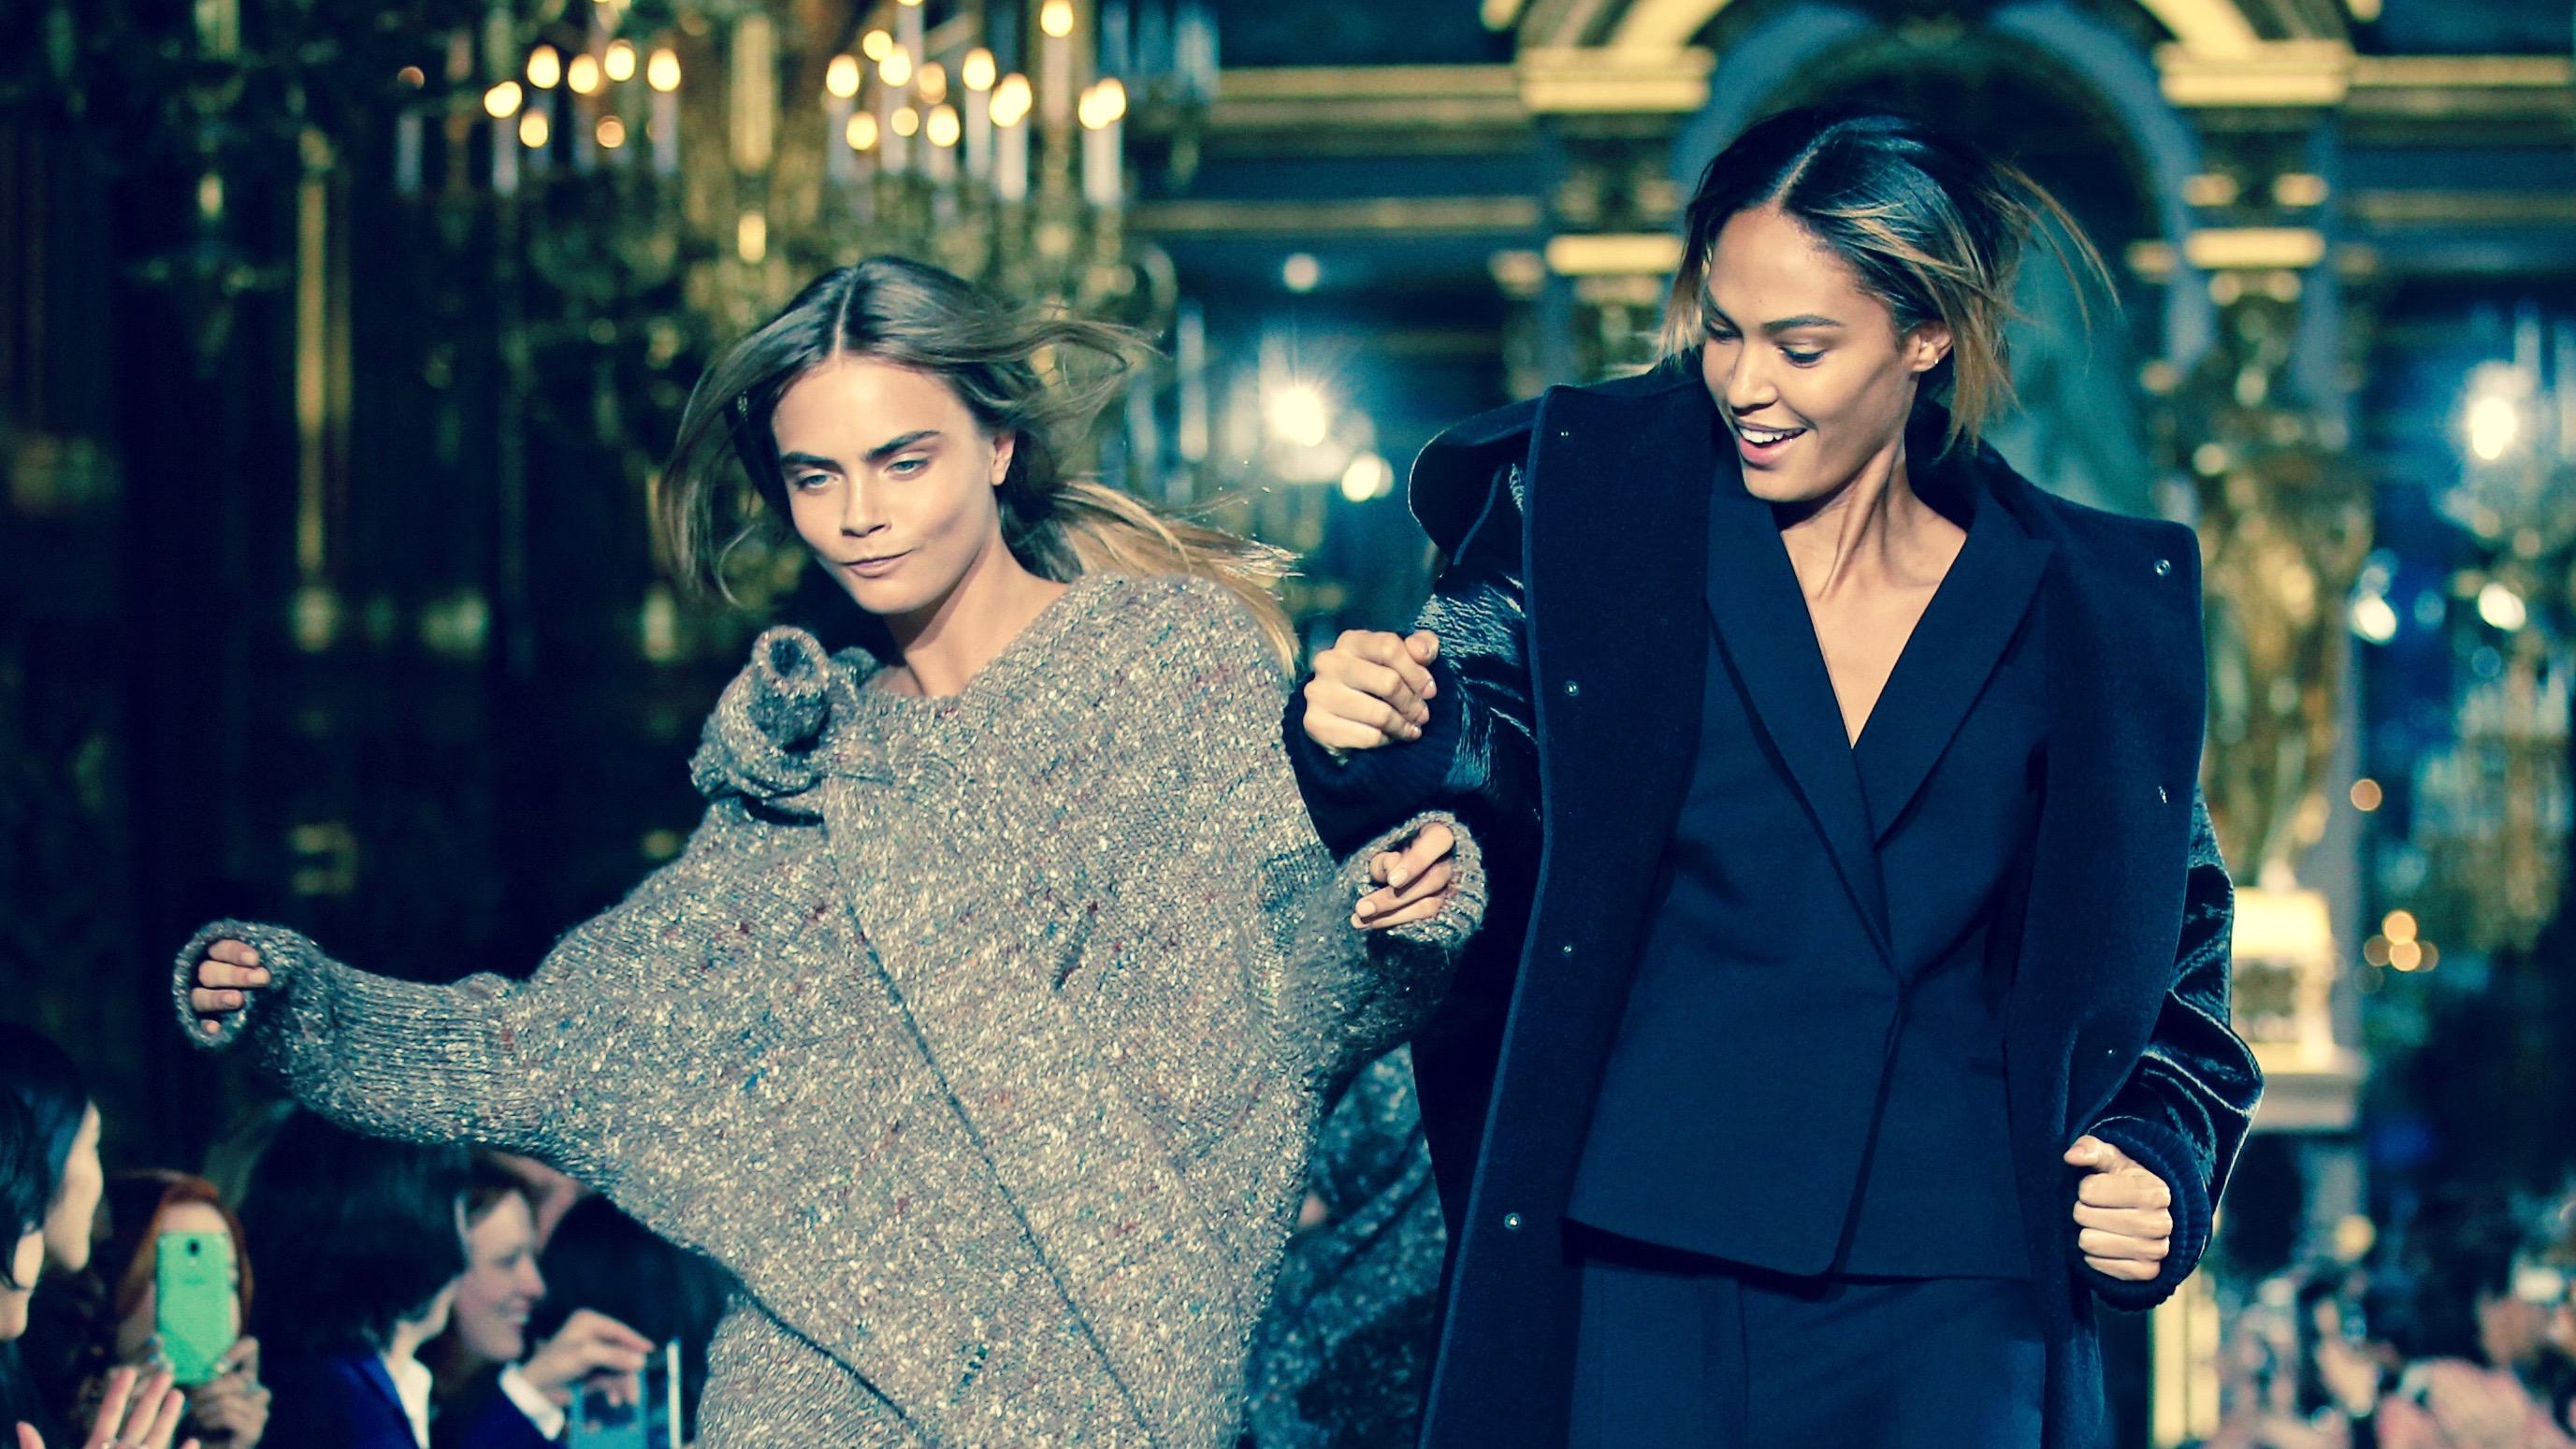 Models Cara Delevingne and Joan Smalls on the runway.